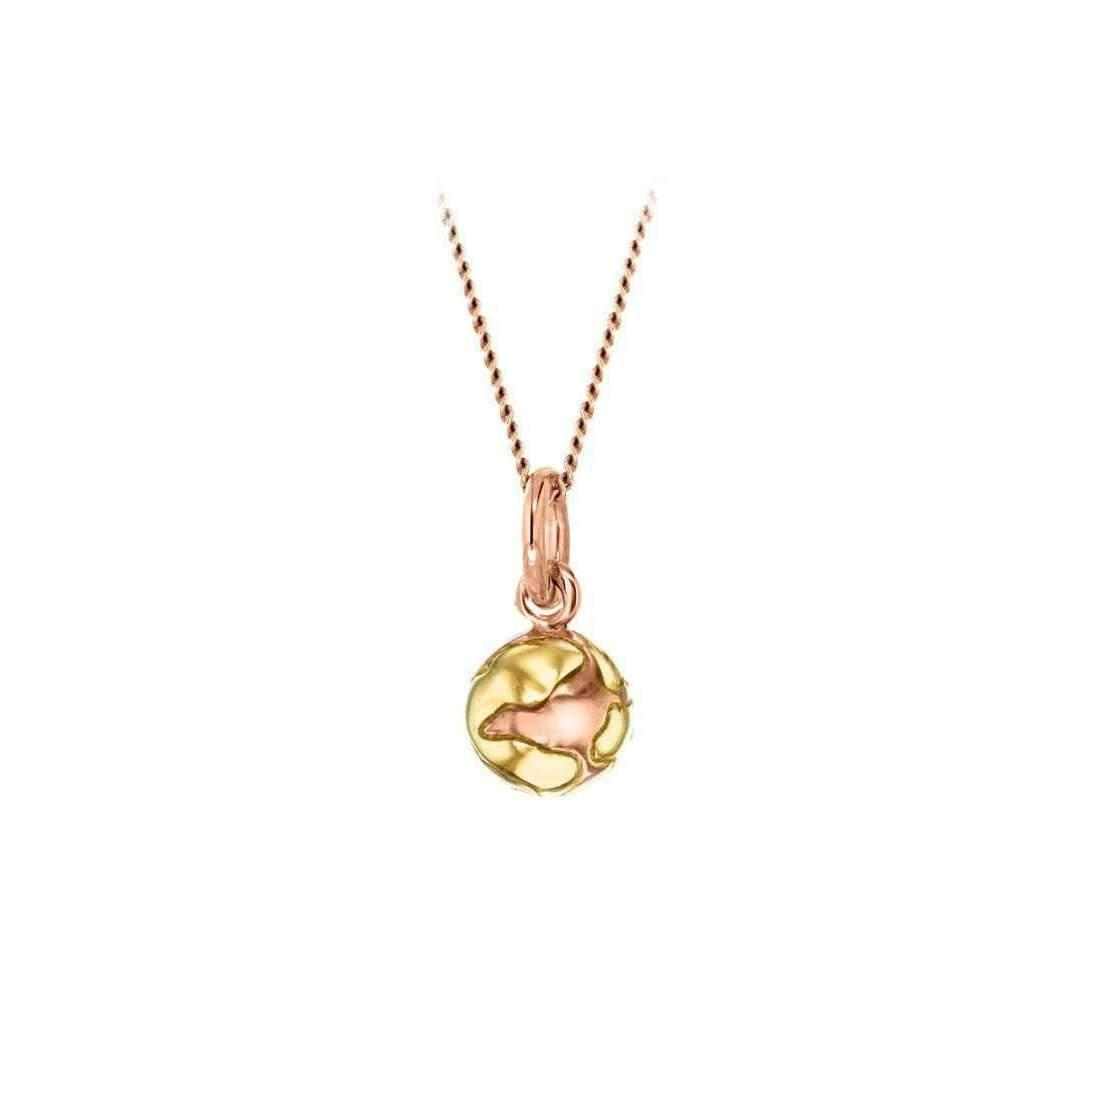 True Rocks Medium Yellow & Rose Gold Plated Silver Revolving Globe Pendant qwOR5Rt